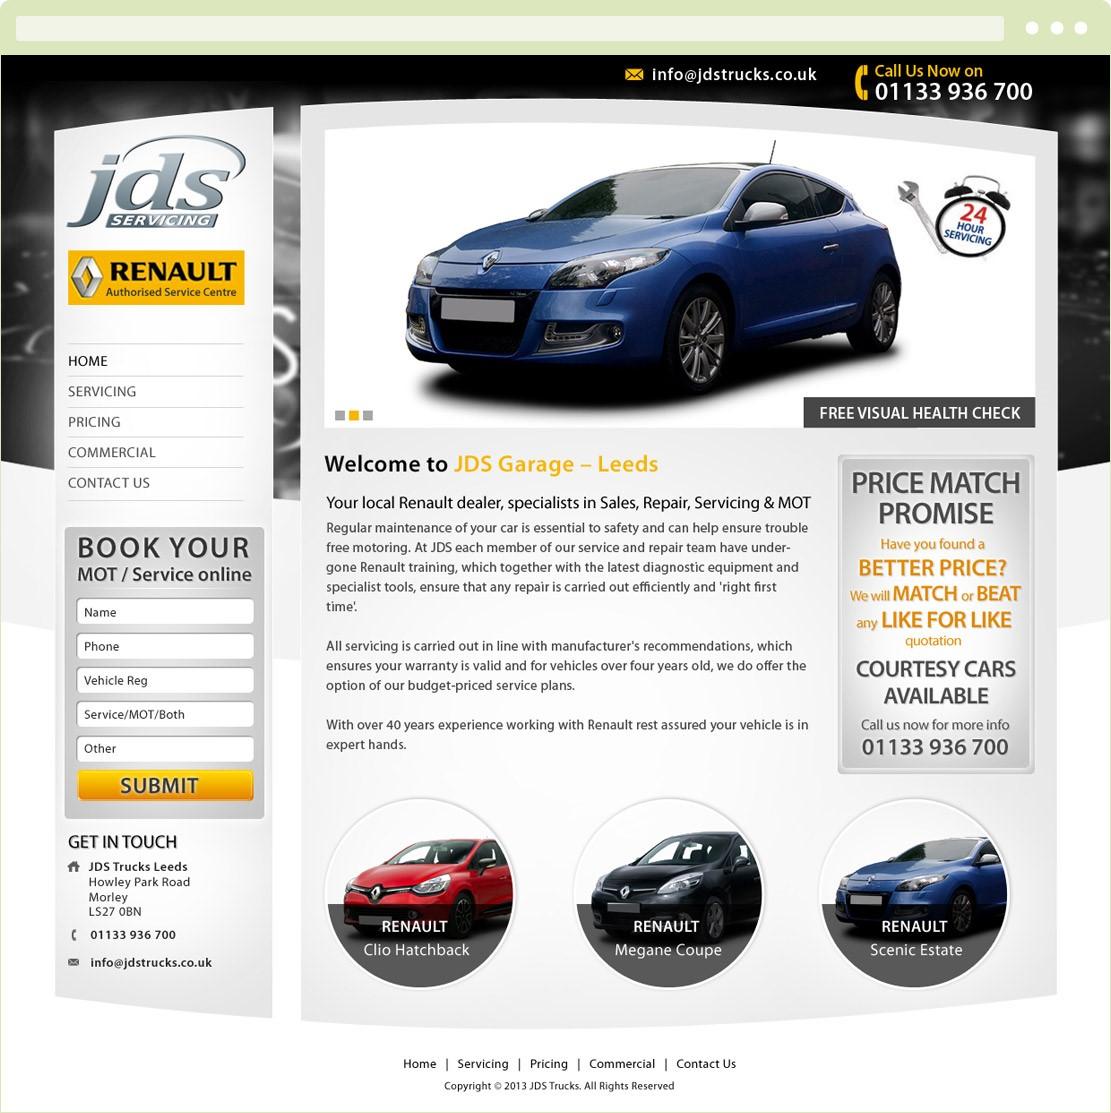 JDS SERVICING